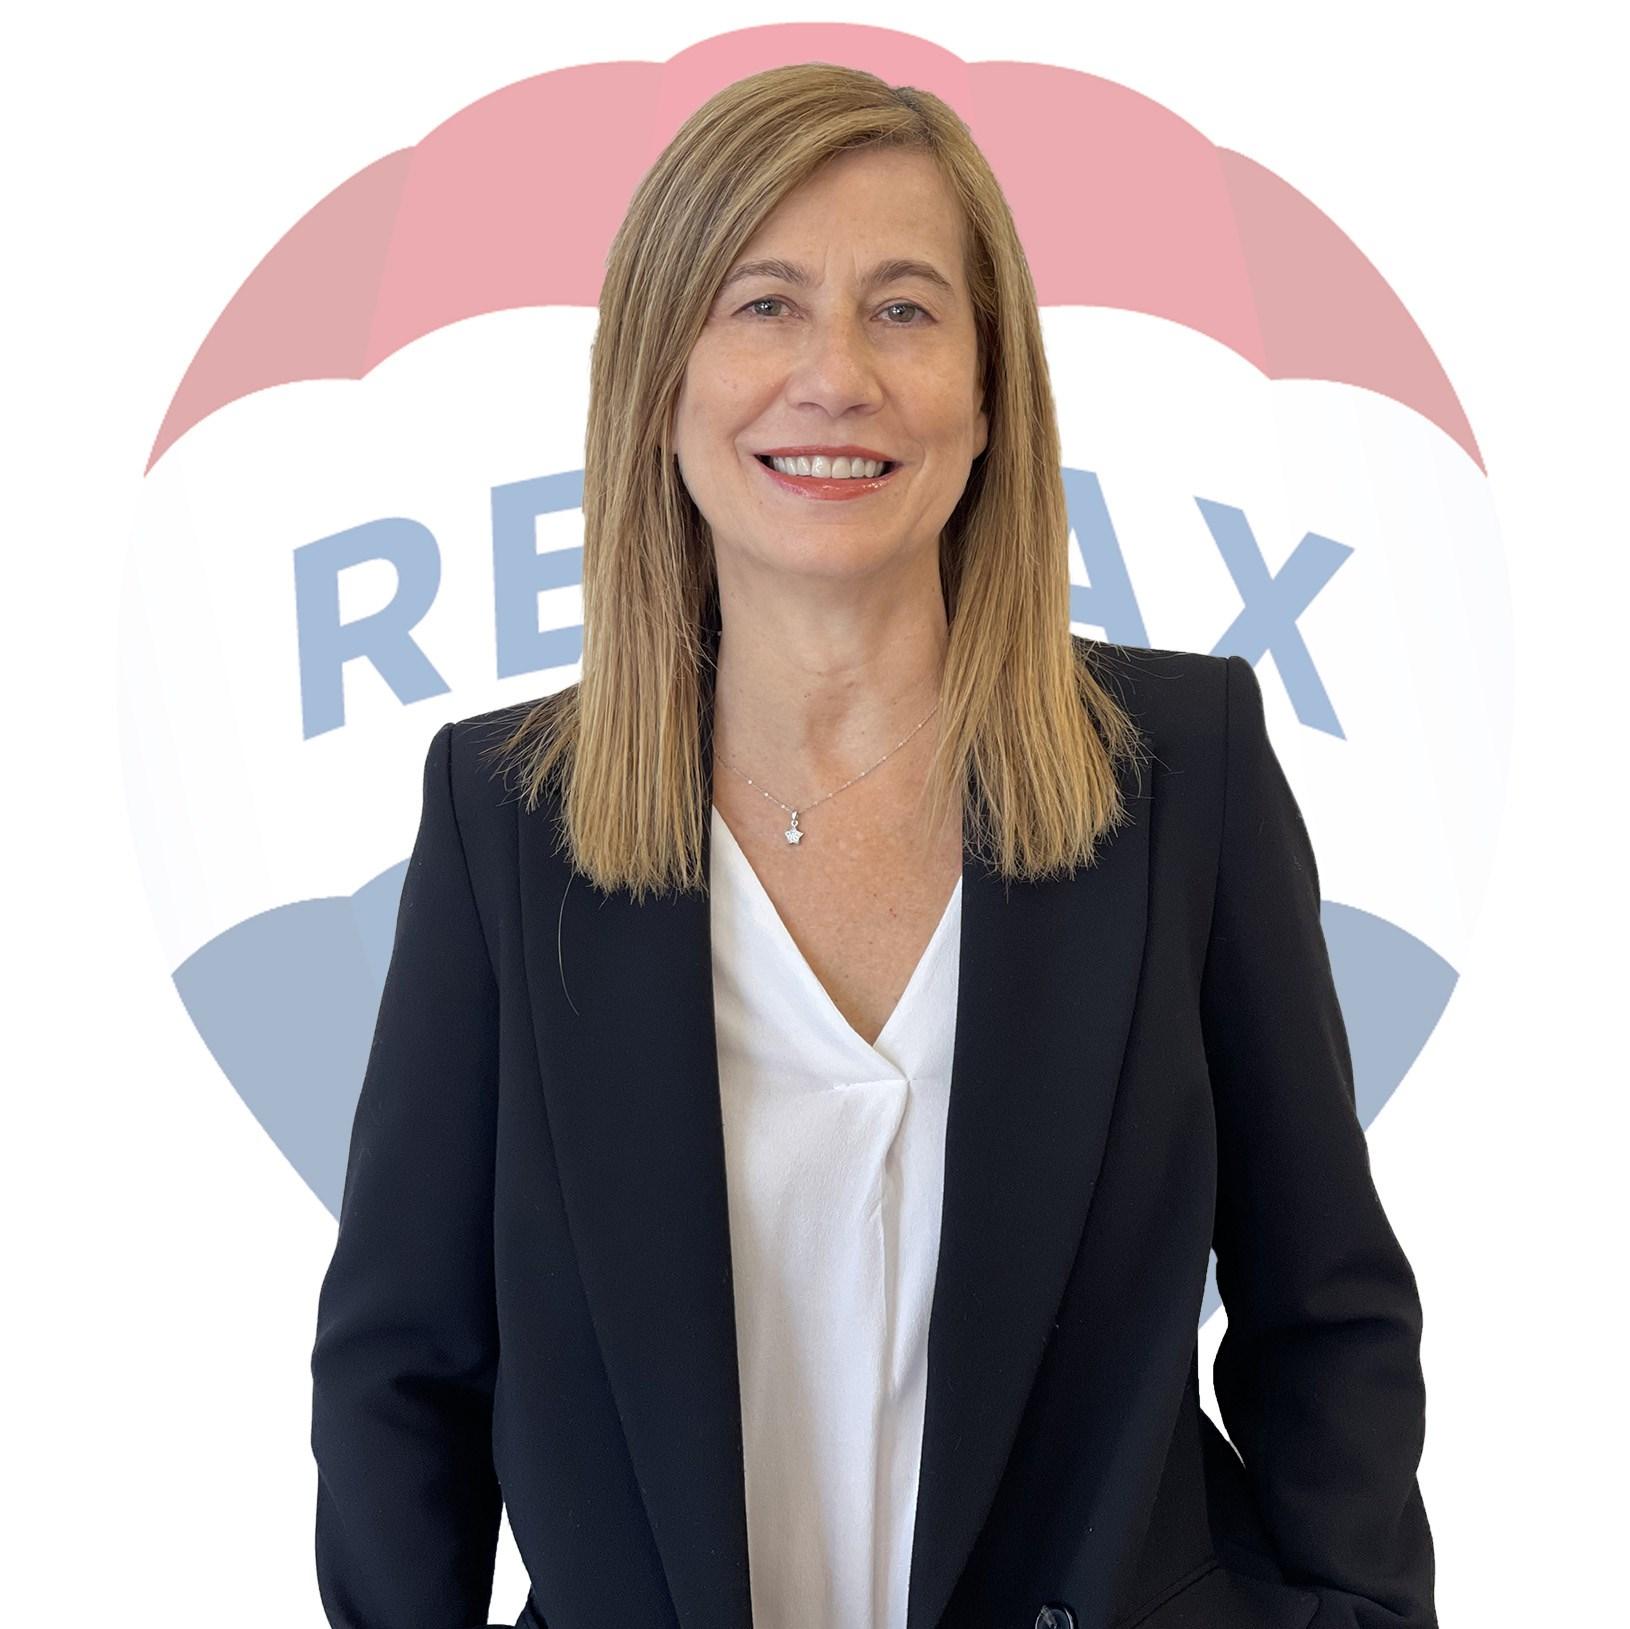 Haydee Rodríguez Fernández